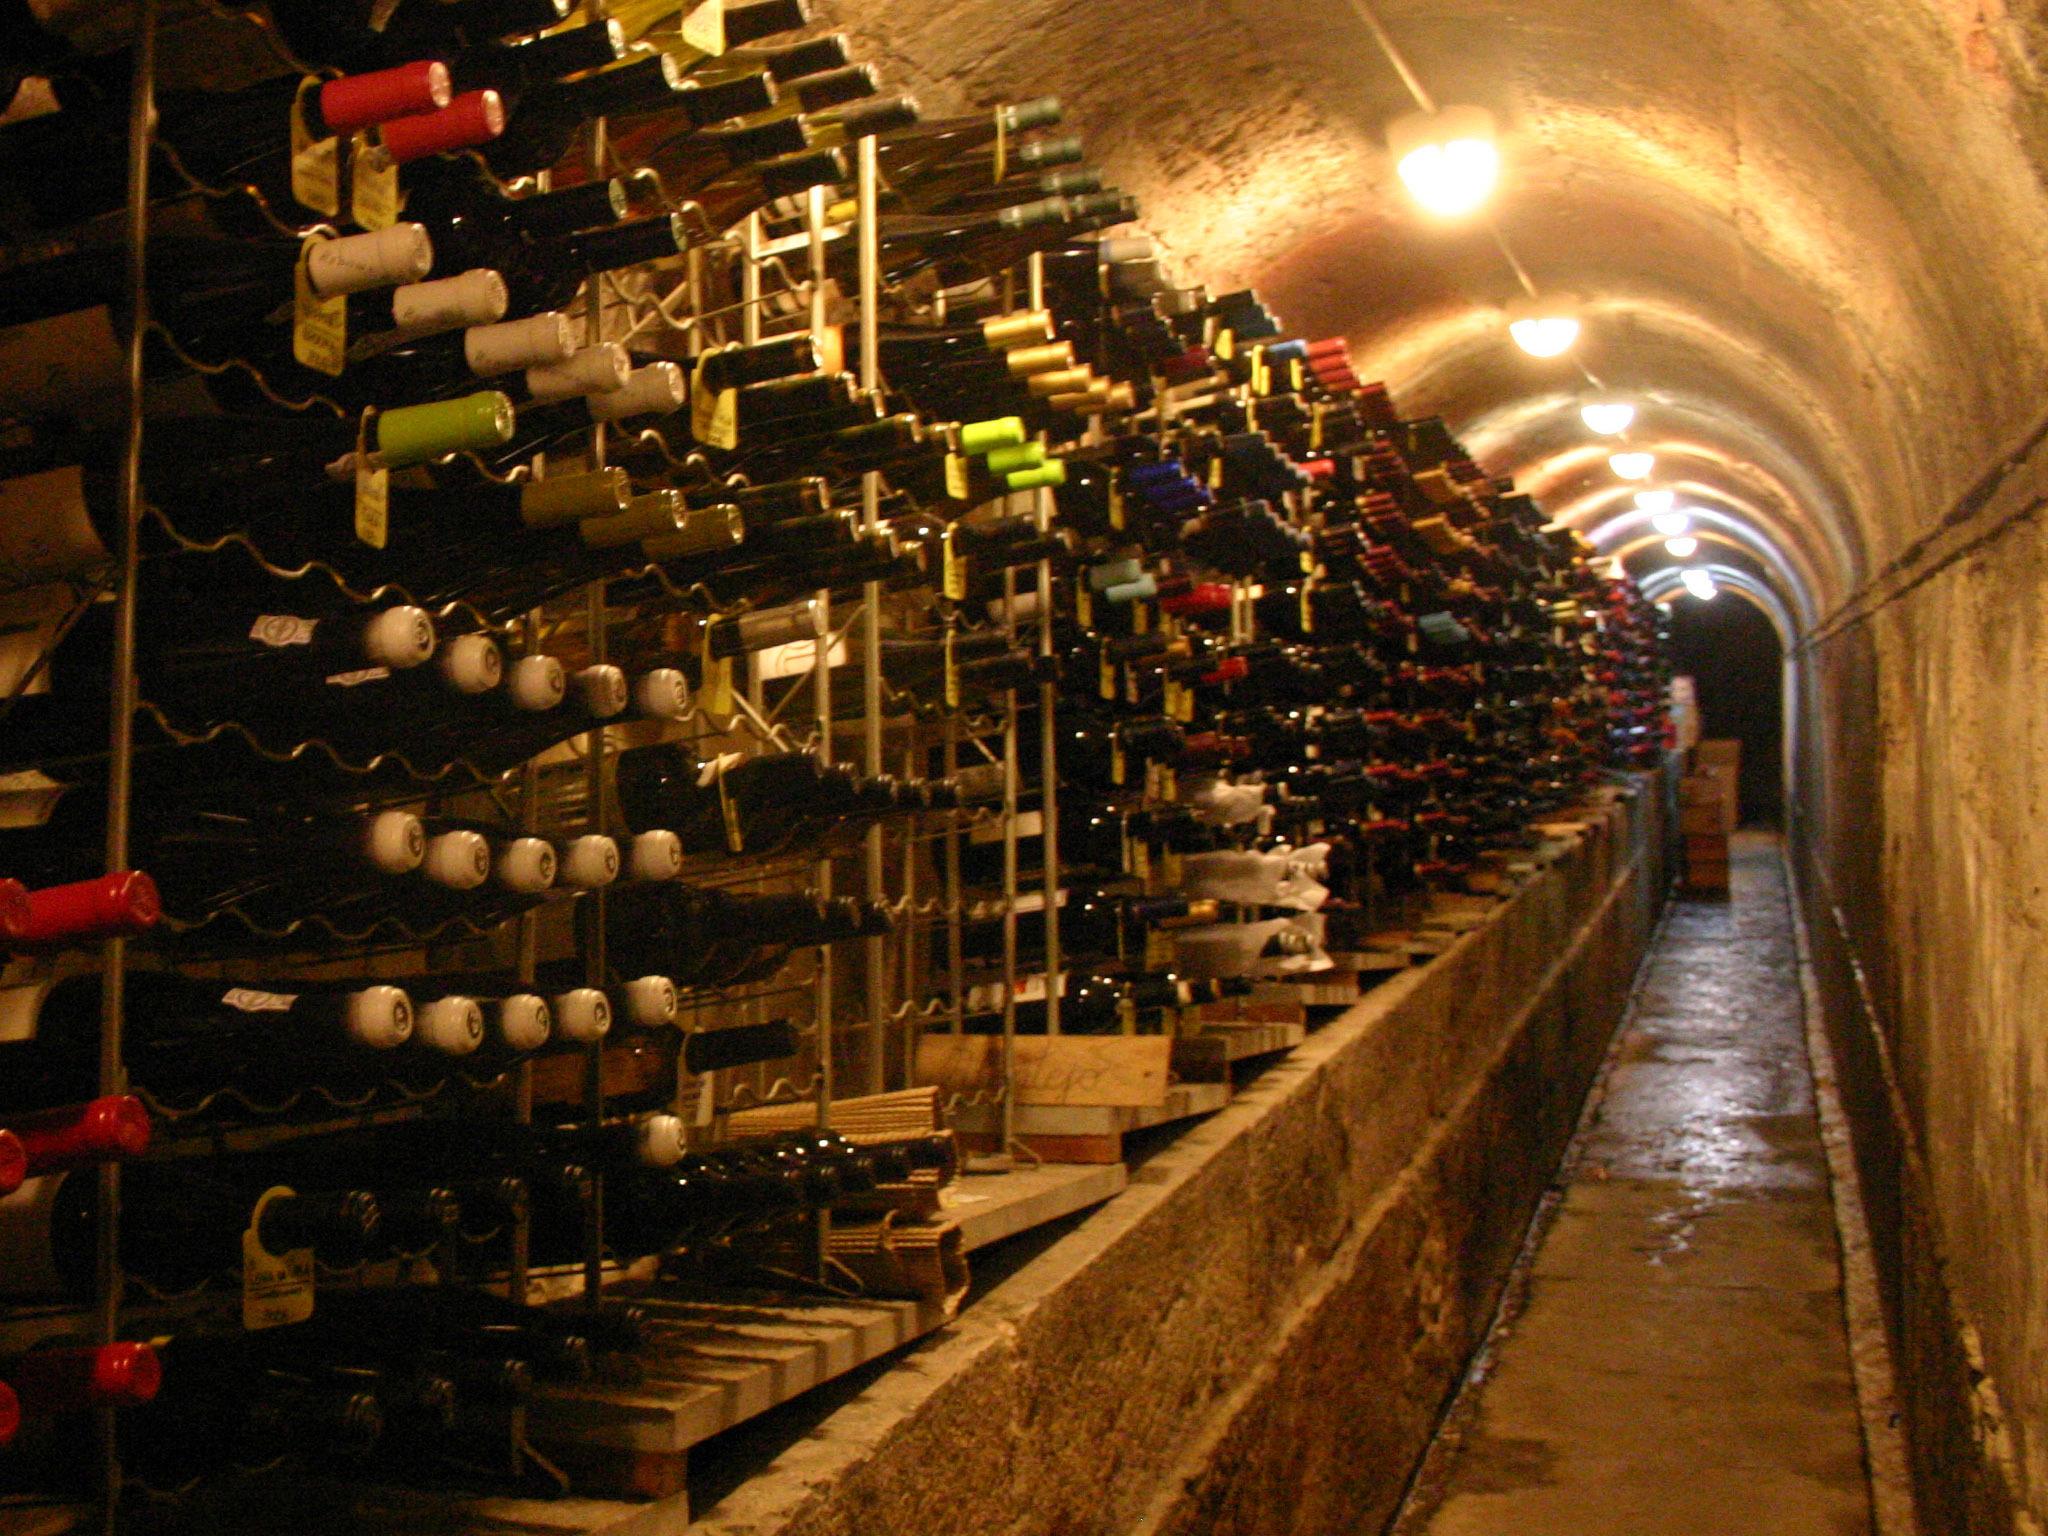 Adega do Chafariz do Vinho